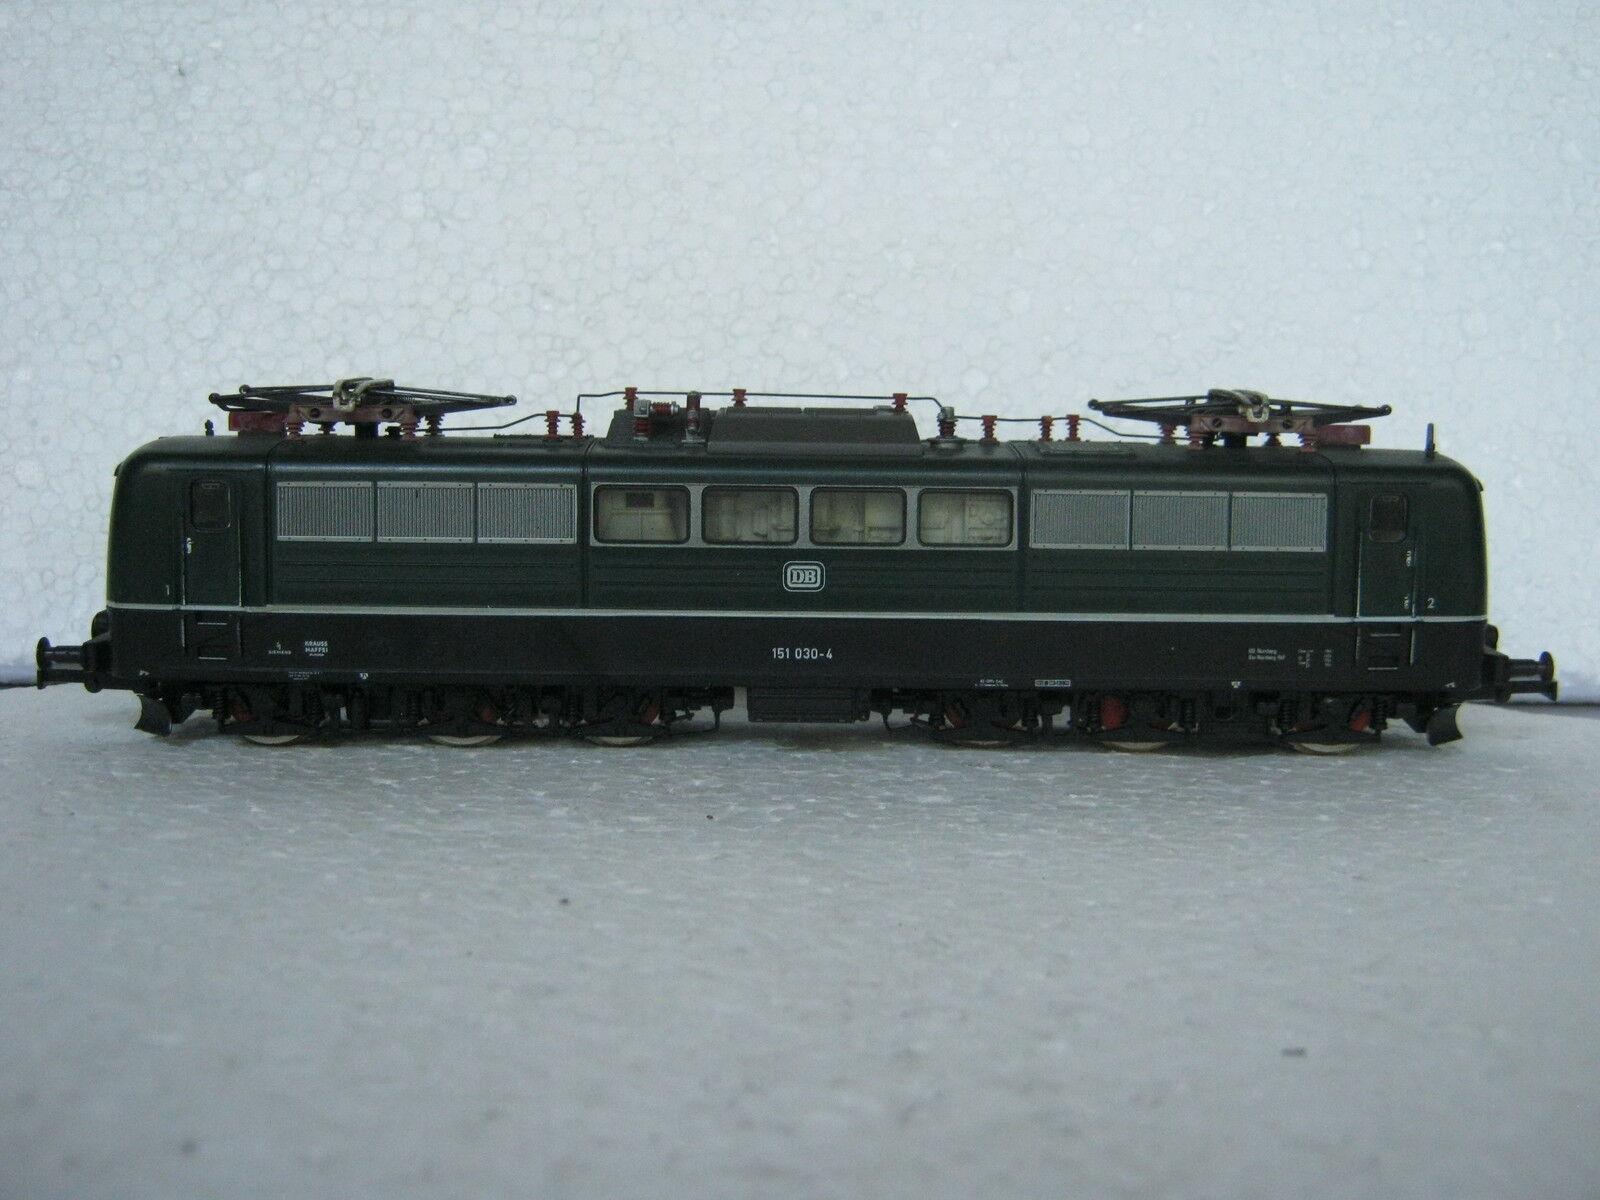 Fleischmann HO 4380 E-LOK BR 151 030-4 DB Green (rg cb 092-45s4 44)